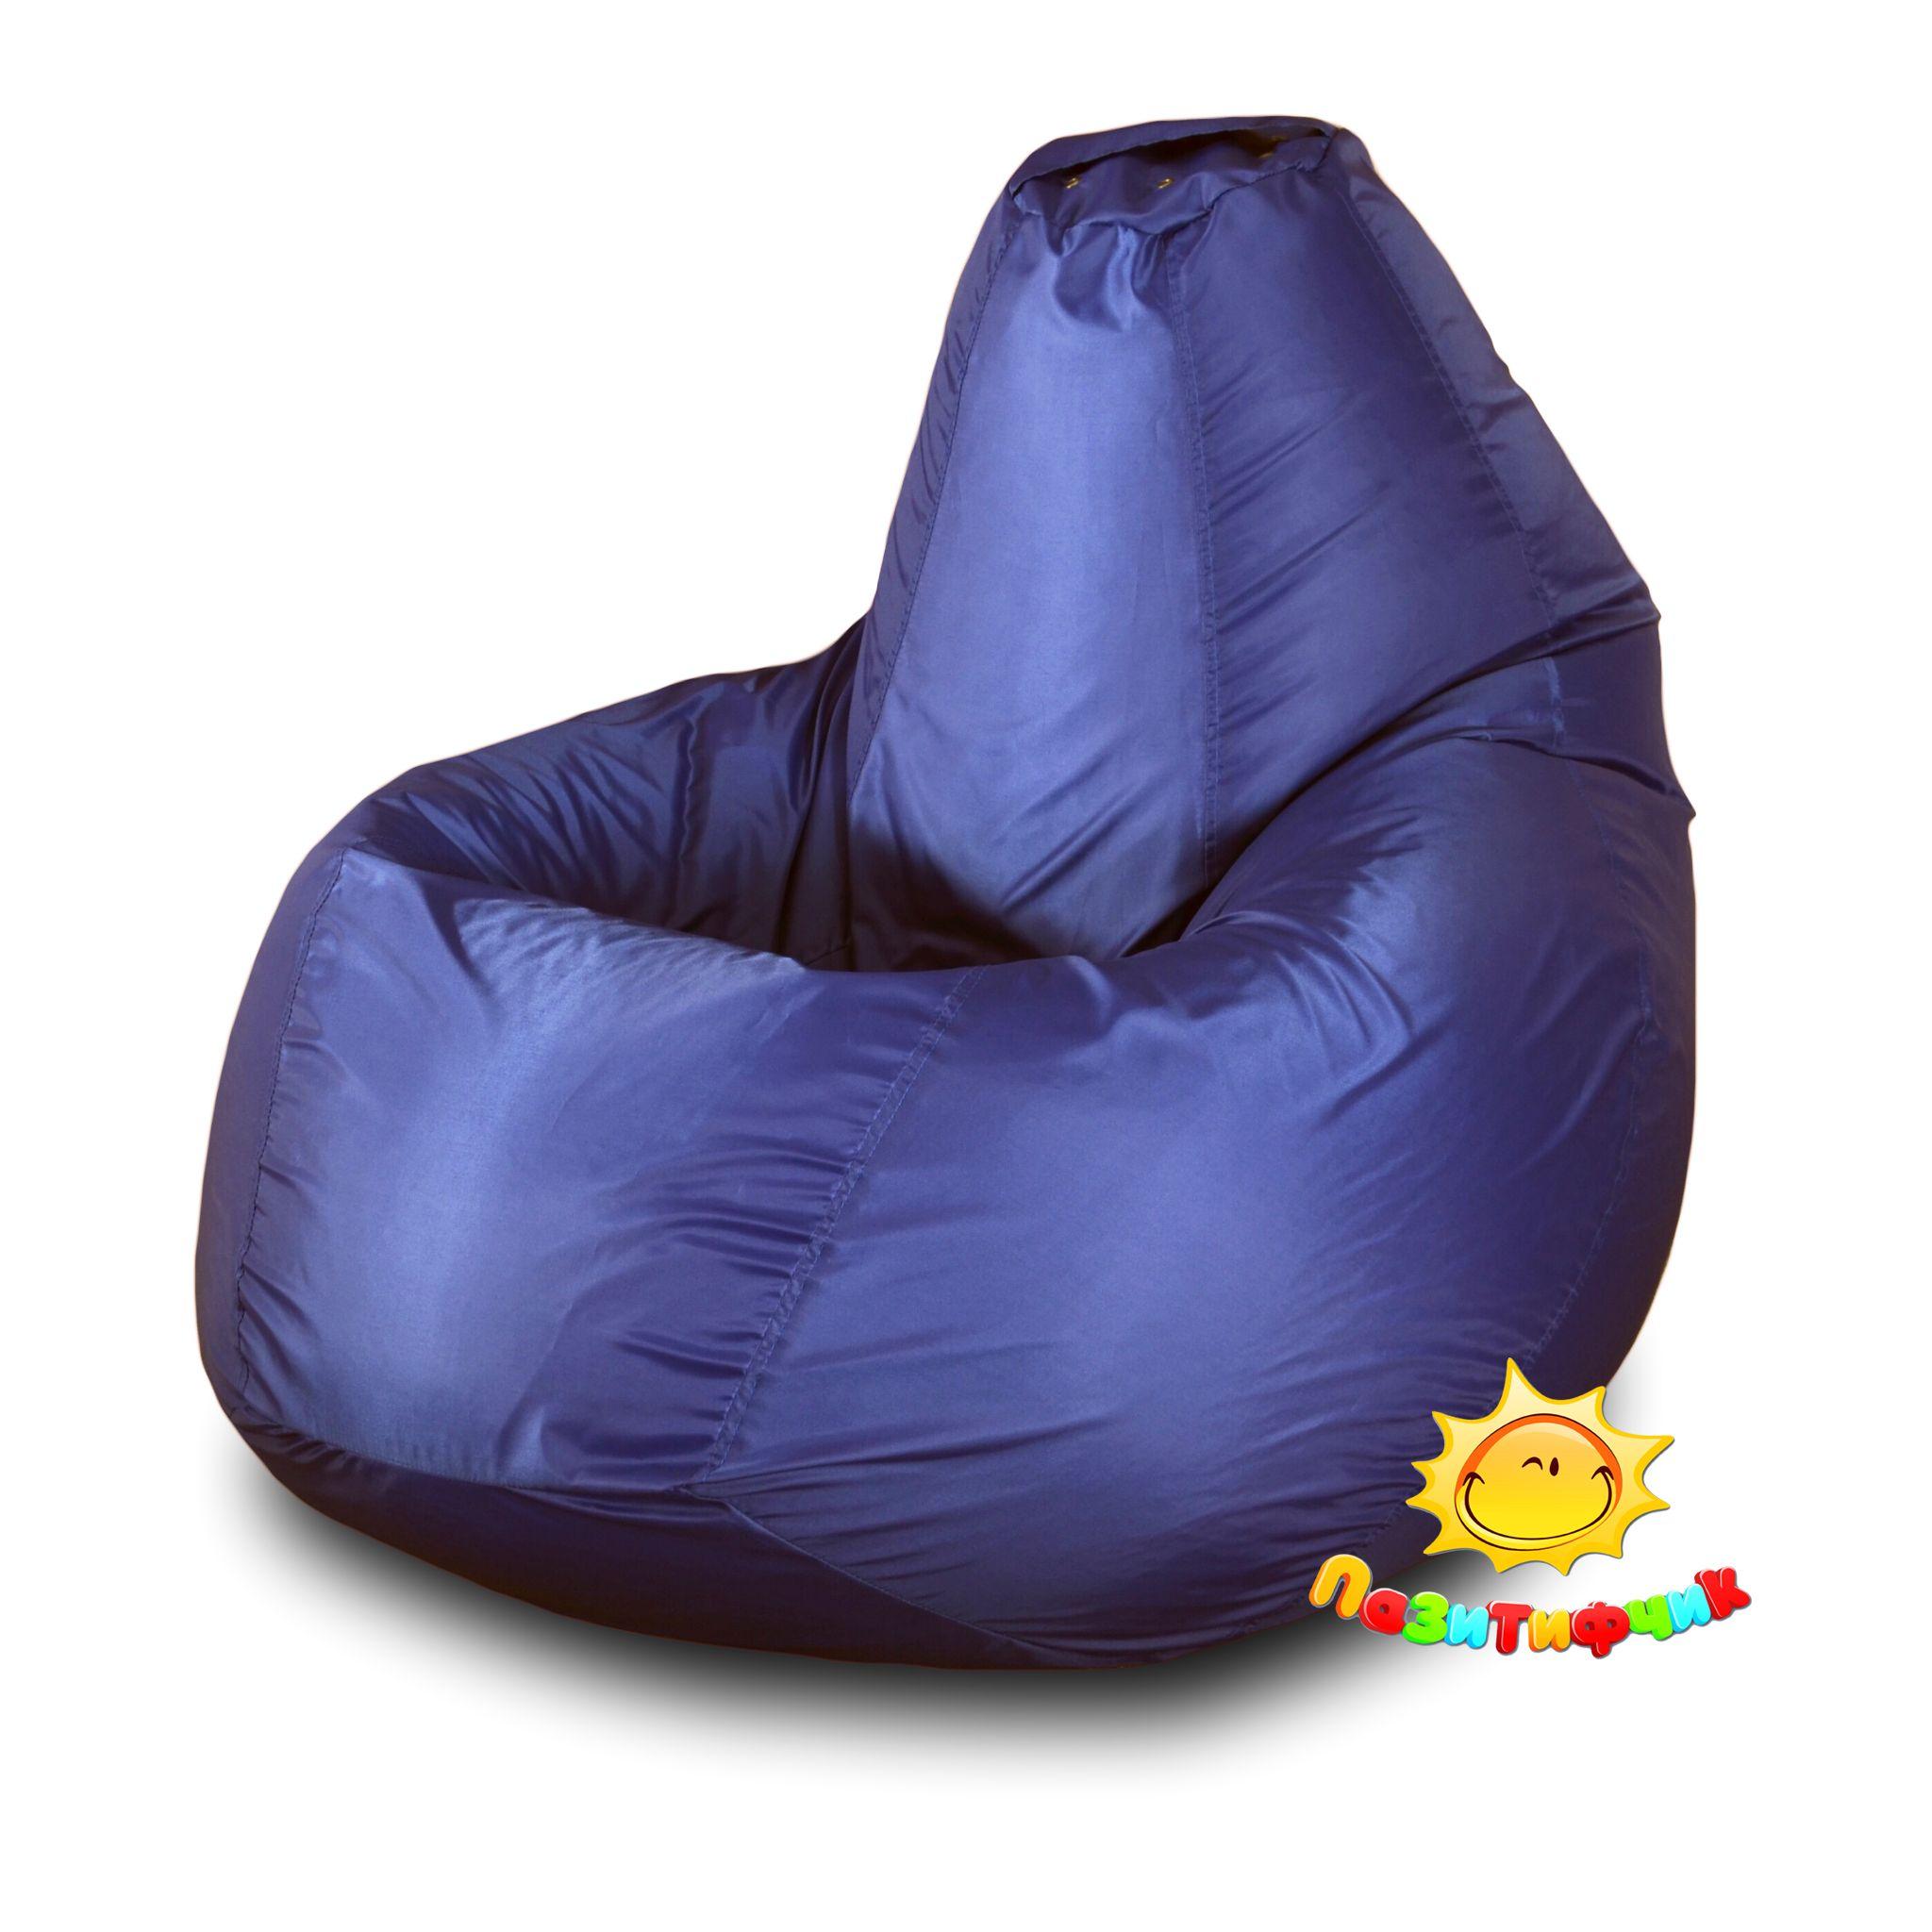 Кресло-мешок Pazitif Груша Пазитифчик, размер L, оксфорд, синий